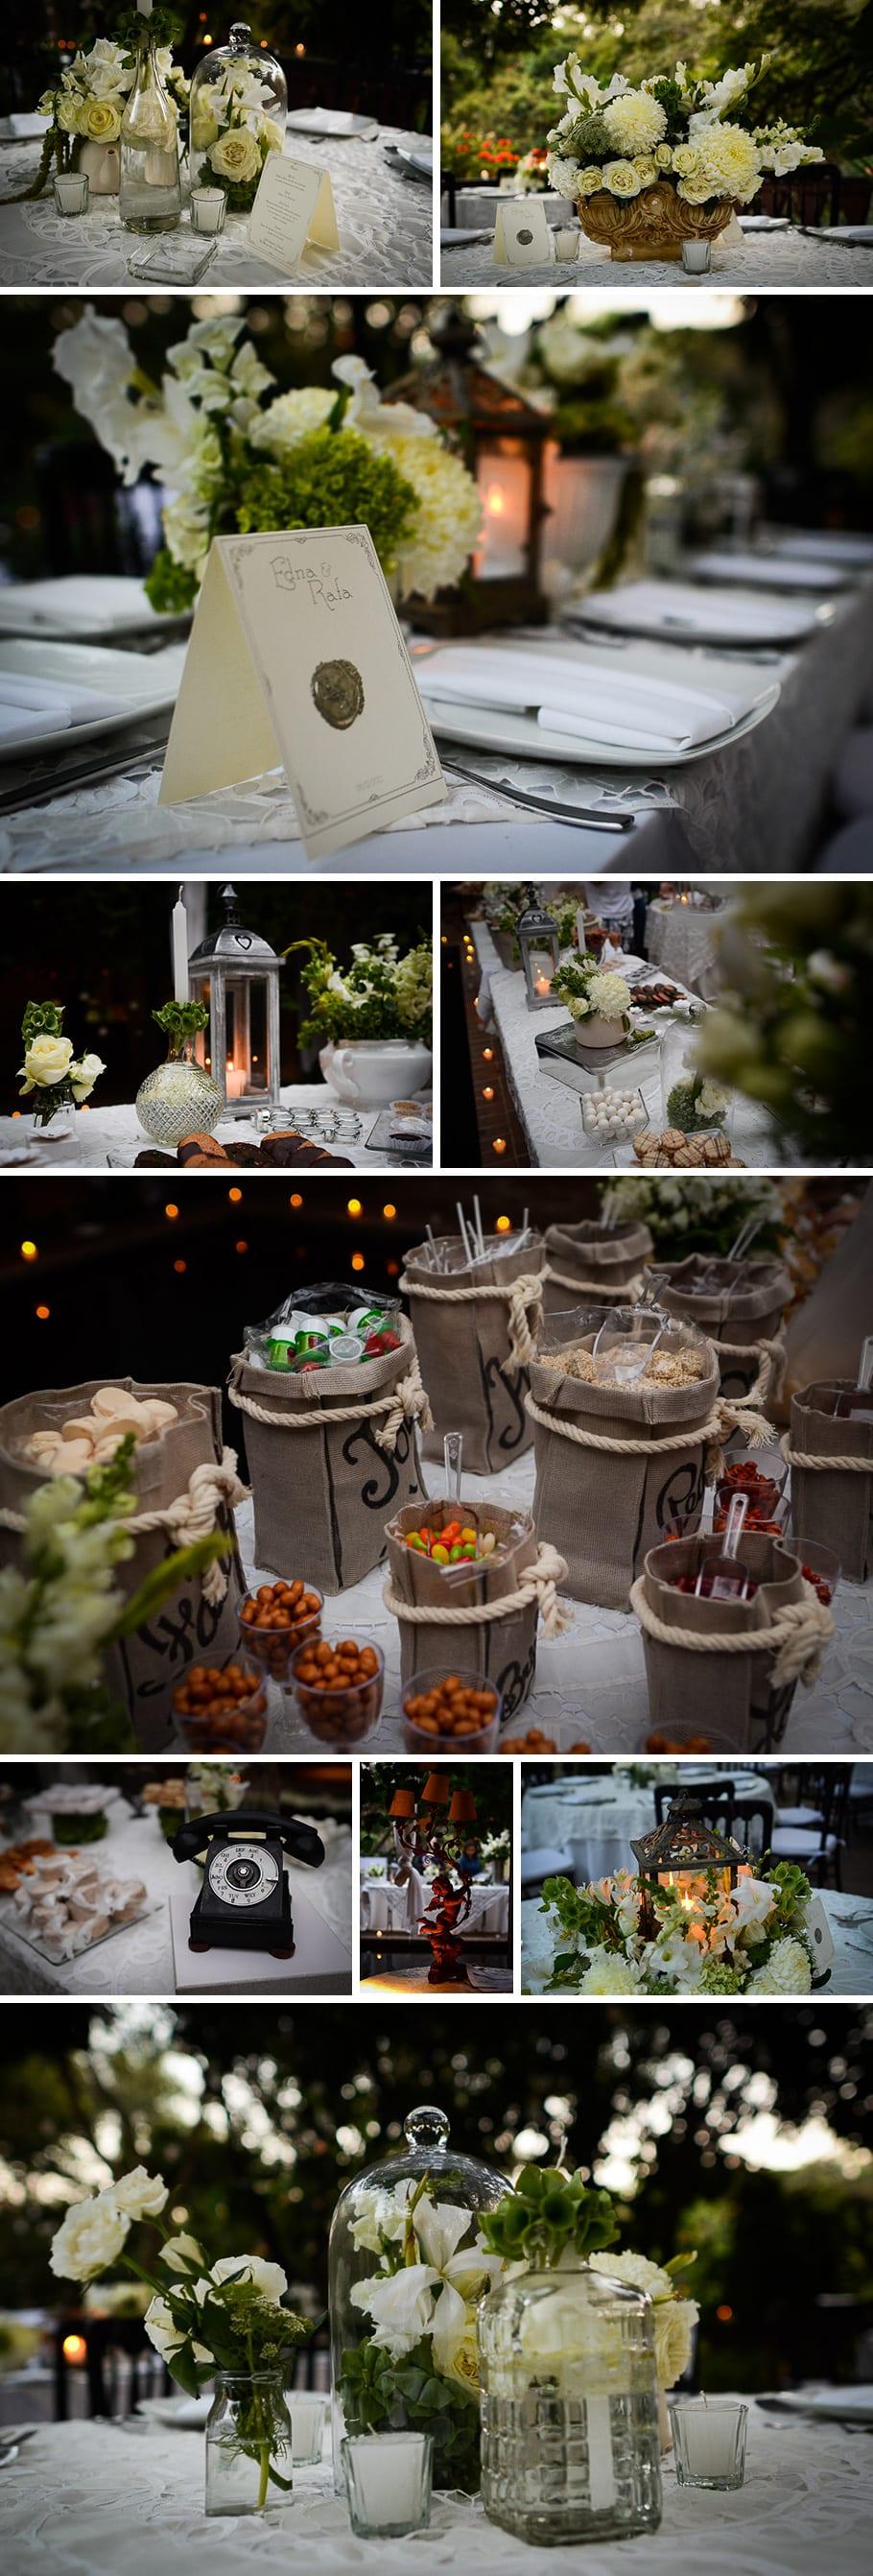 Blog-Collage-1381428664670